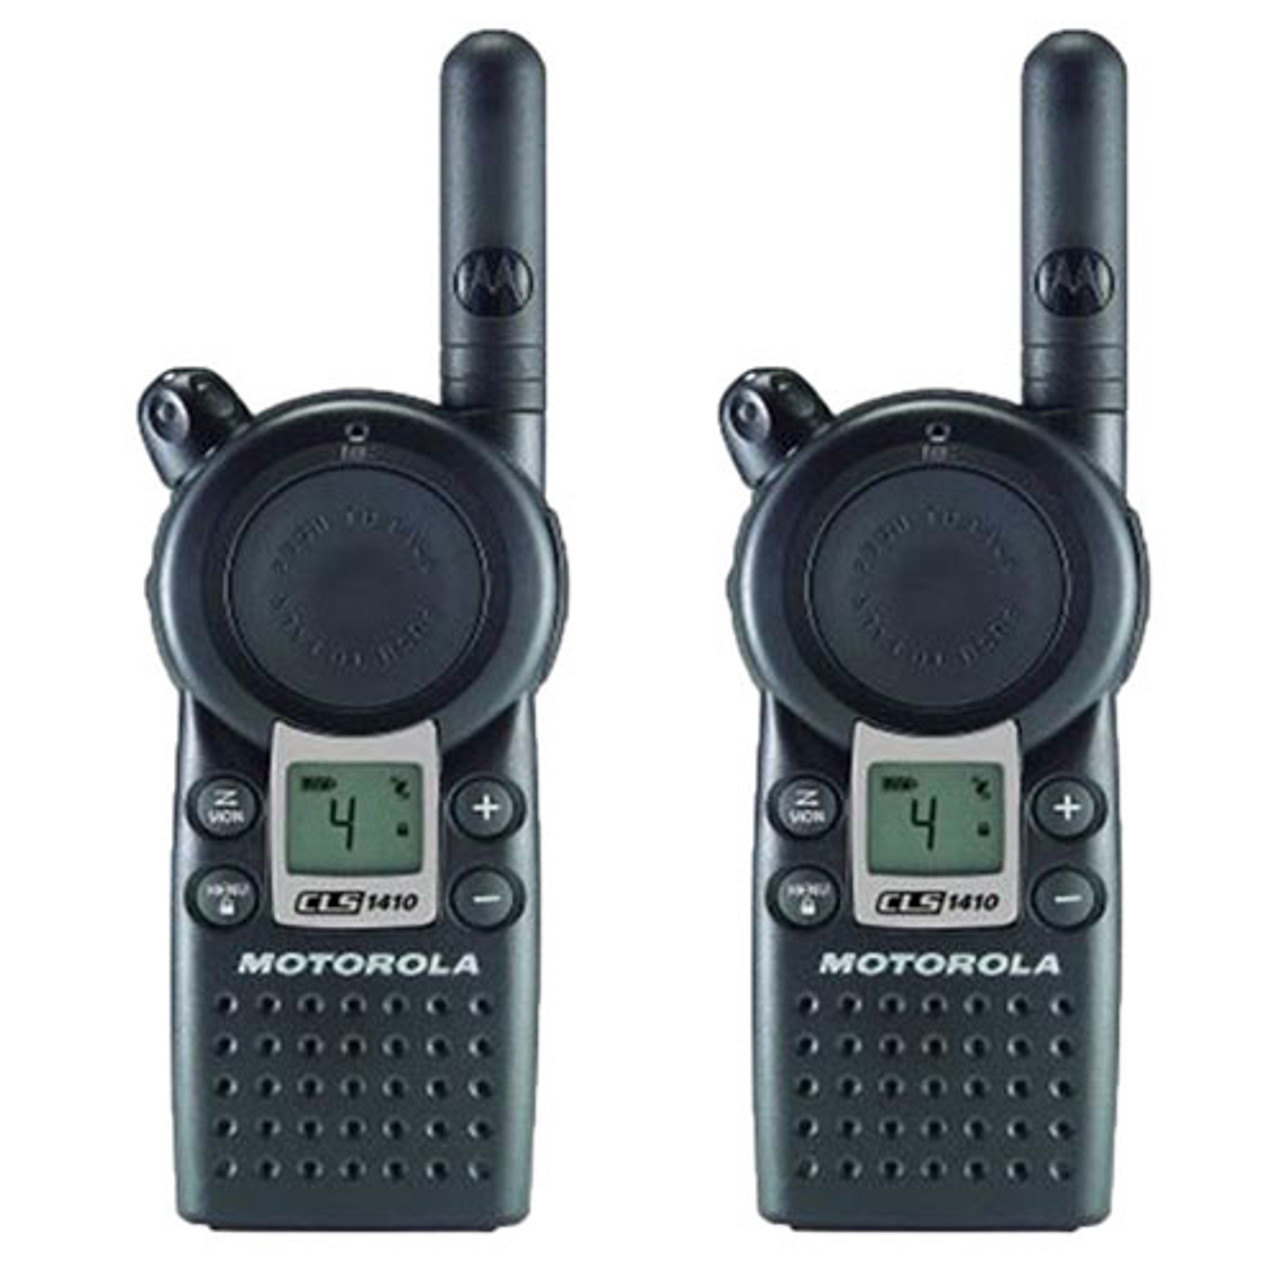 Motorola CLS1410 1 Watt 4 Channel UHF Two Way Radio Bundle of 2 Two Way Radios